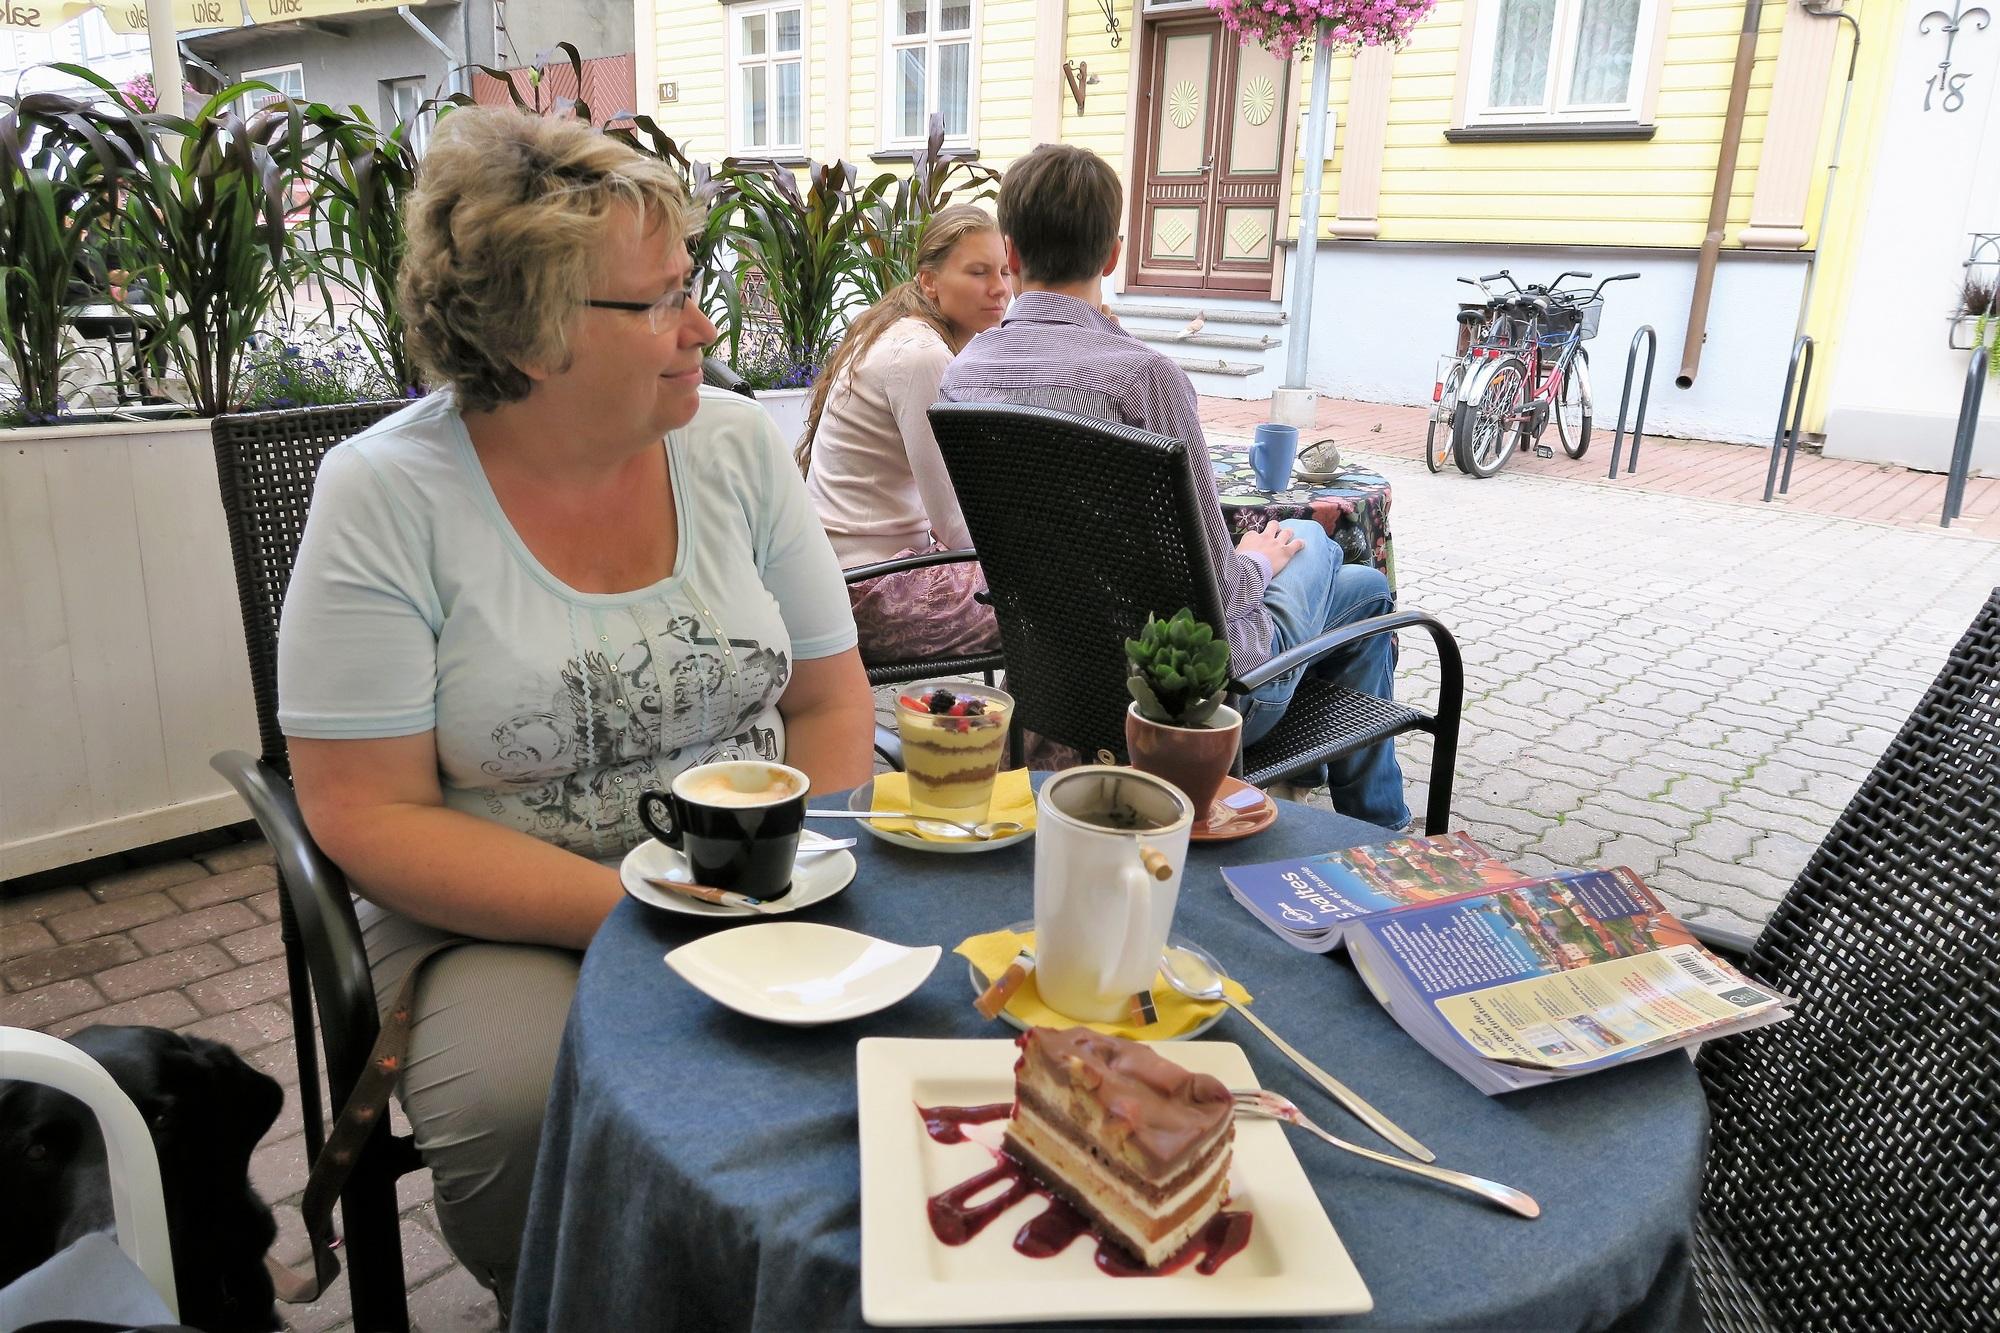 PÄRNU (EST) A la terrasse du café Piccadilly